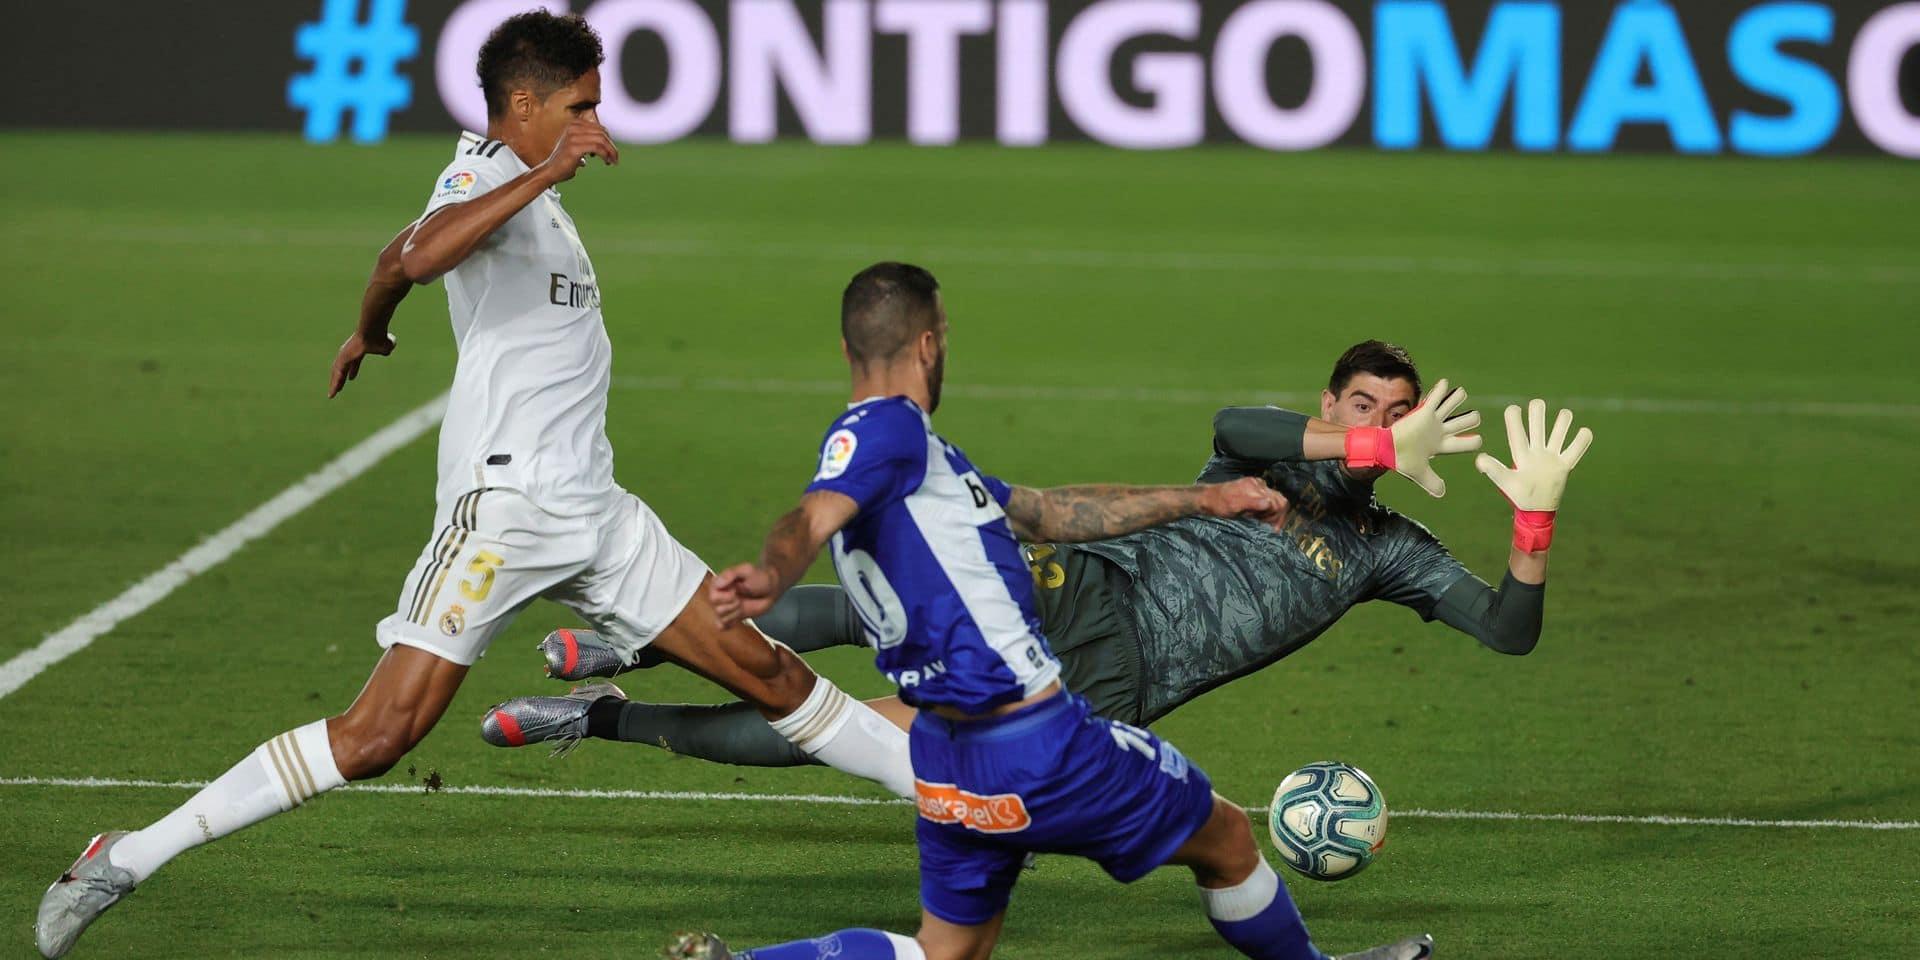 Real Madrid - Deportivo Alaves